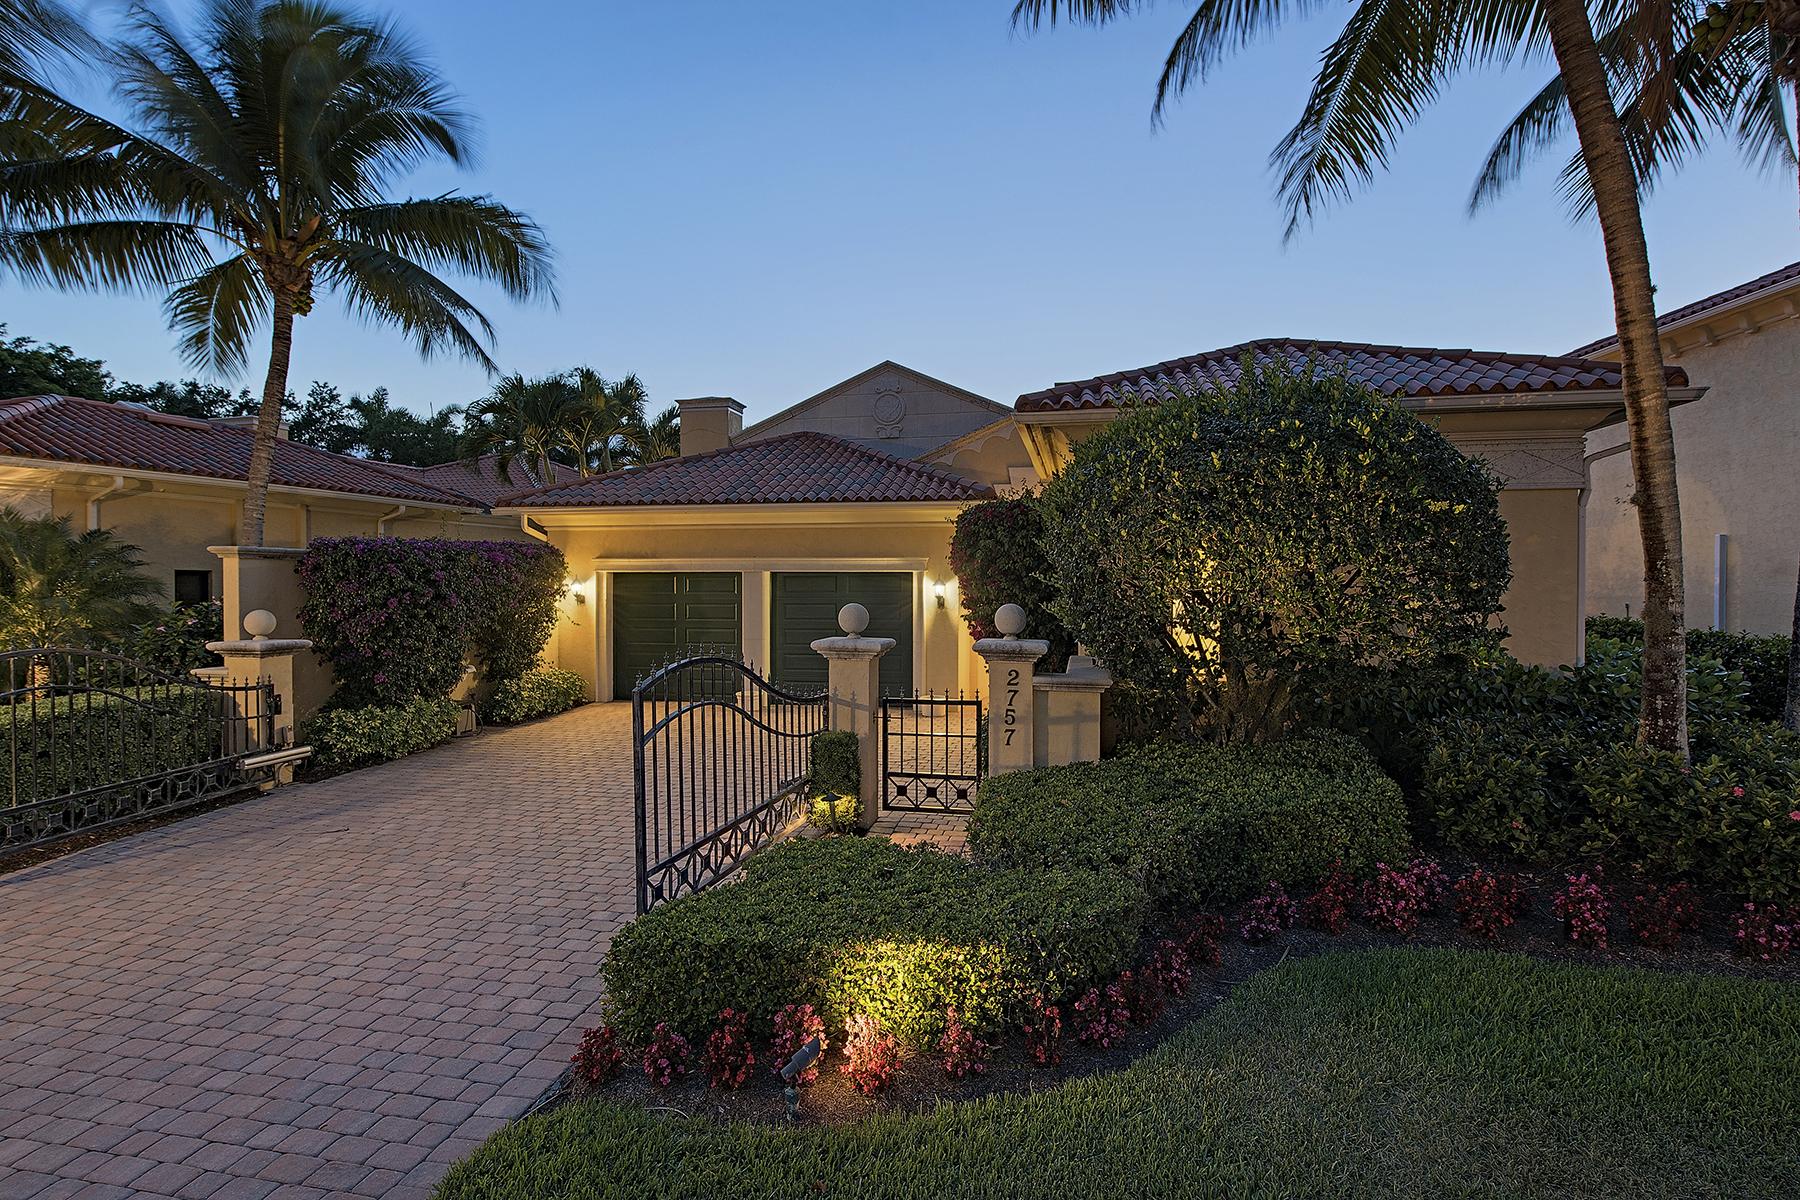 Single Family Home for Sale at 2757 Medallist Ln , Naples, FL 34109 2757 Medallist Ln Naples, Florida, 34109 United States